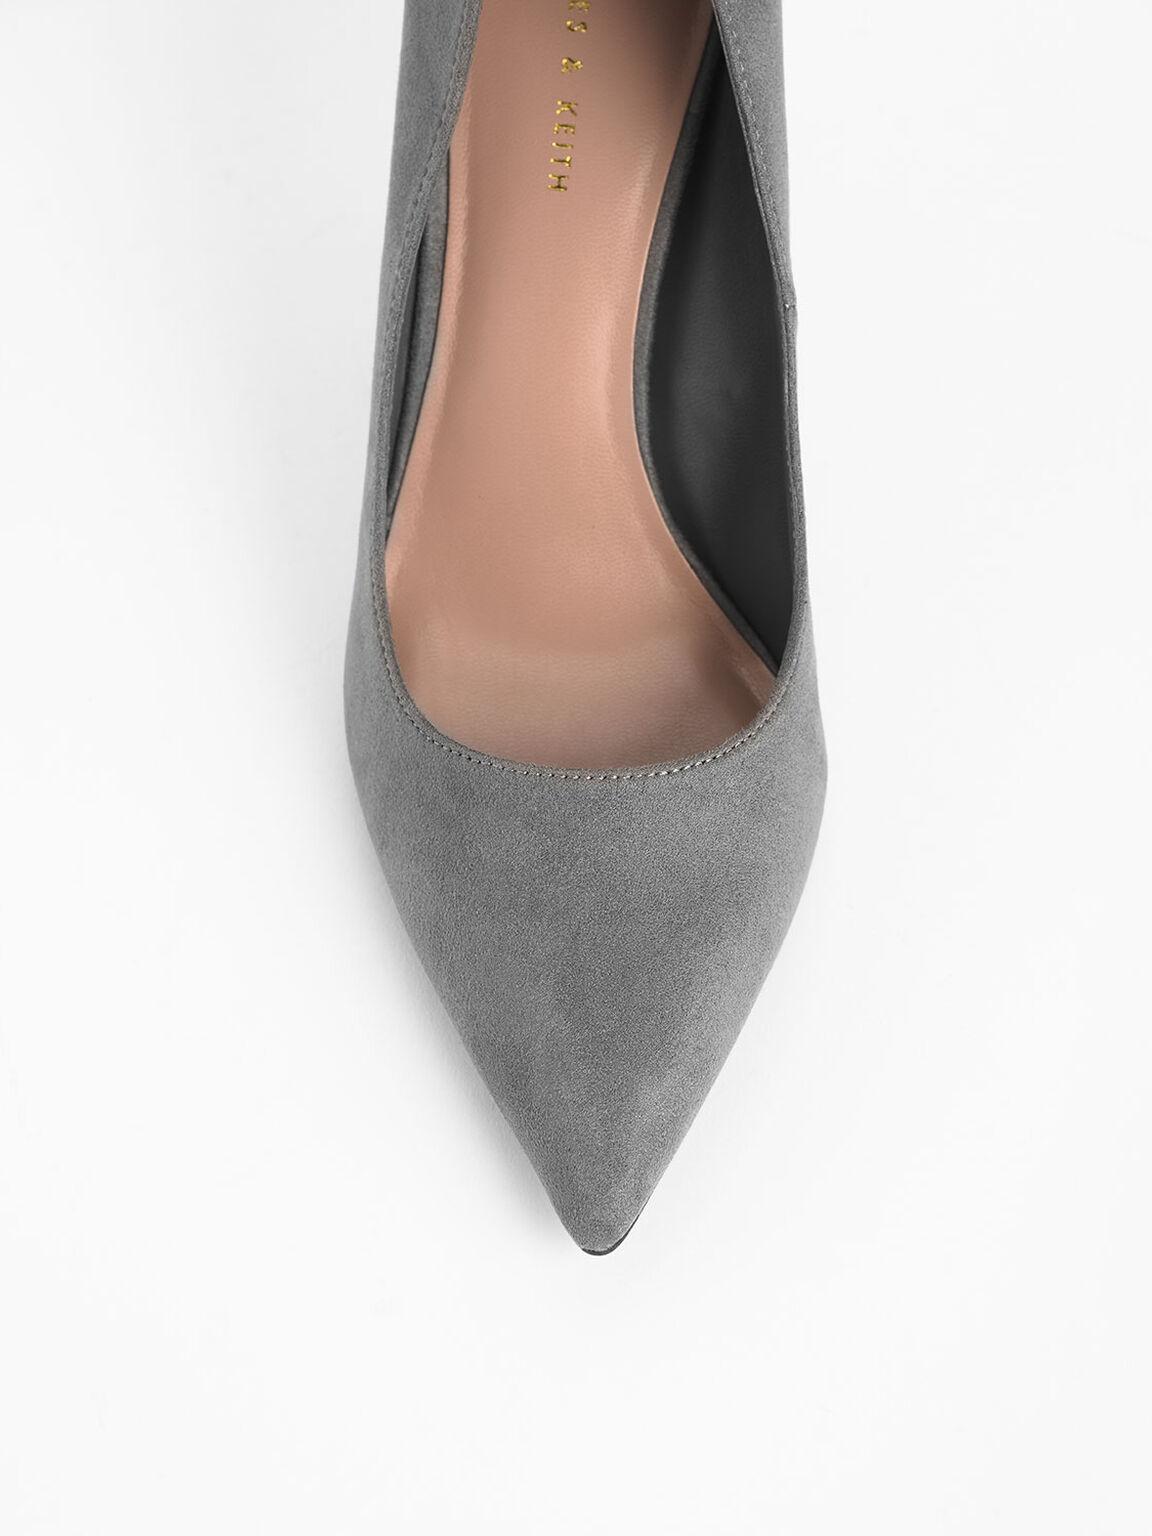 Classic Textured Pointed Toe Pumps, Grey, hi-res